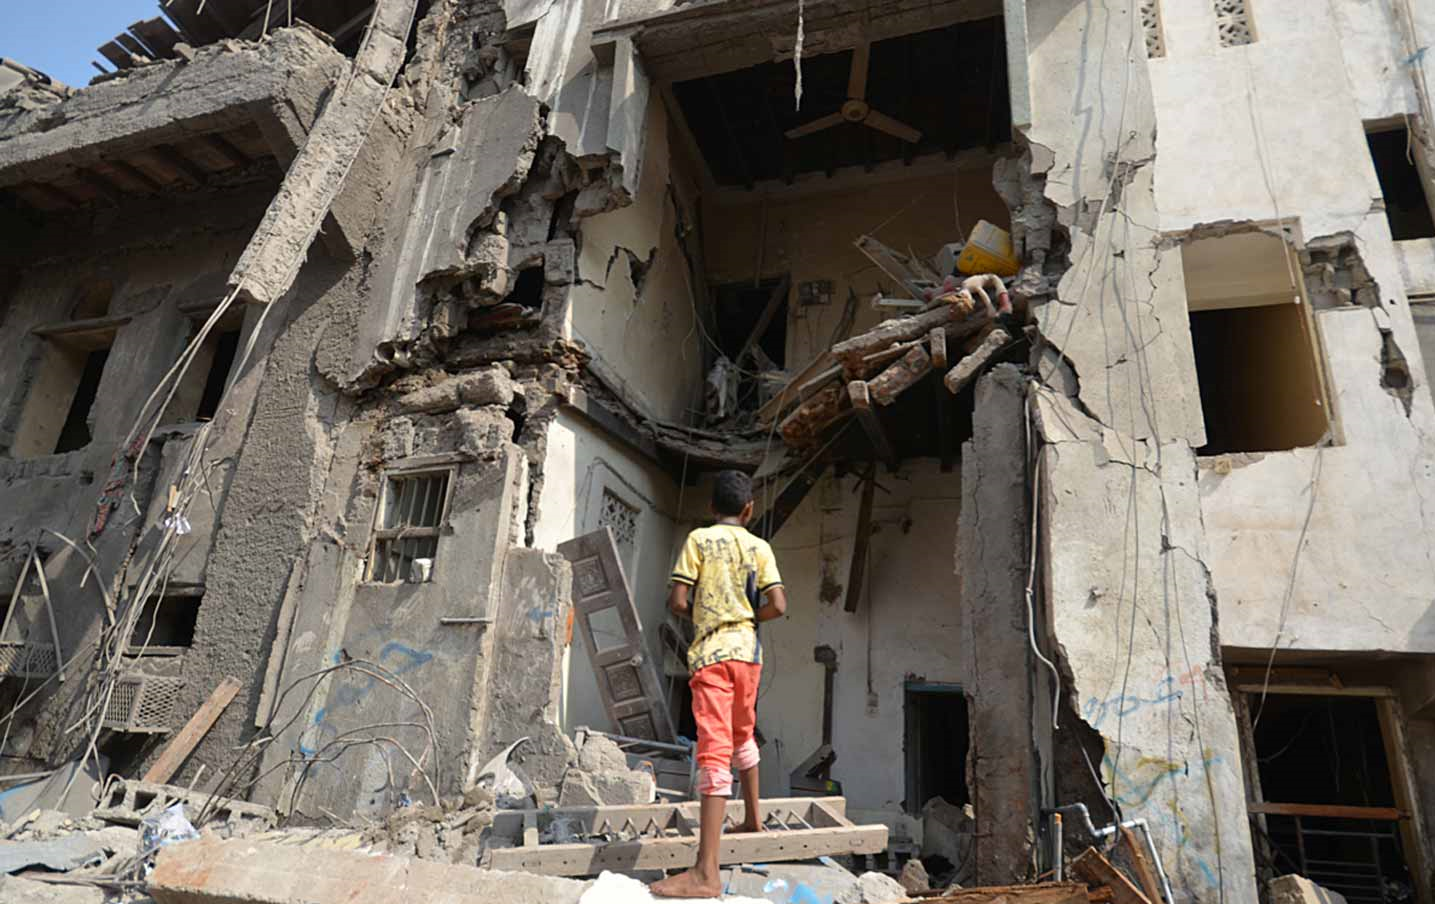 13990615001139 Test NewPhotoFree - گفتوگو با خبرنگار حاضر در کشتی «نجات» | یمن را خبر یک جهان کردیم